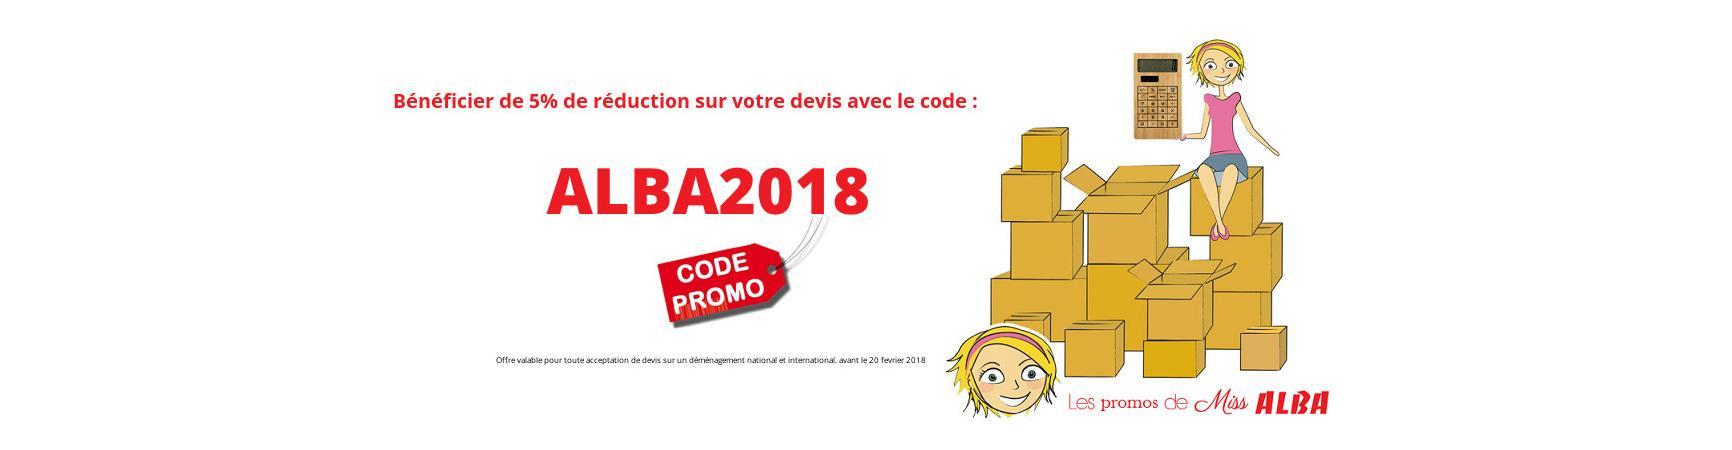 promoALBA2018-022018